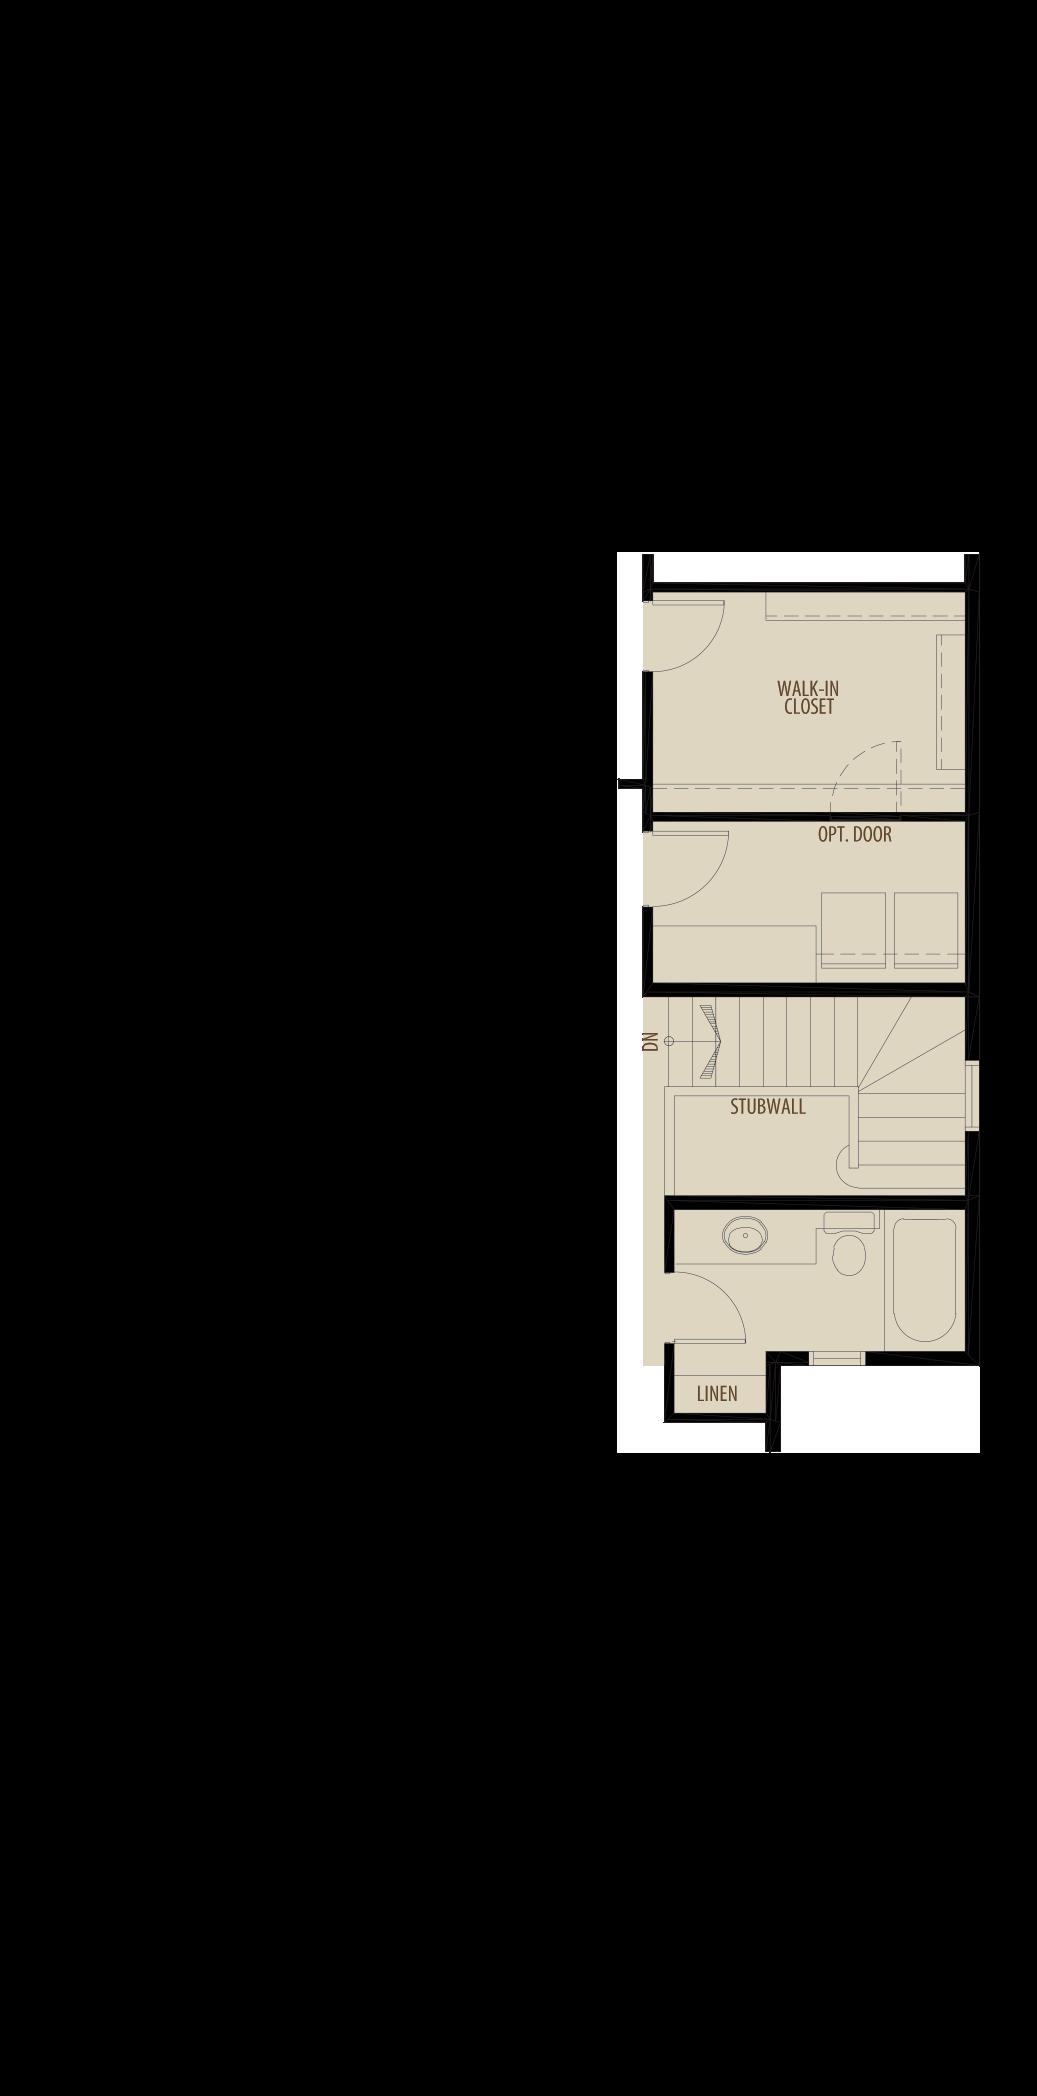 Upper Laundry 2 adds 62sq ft